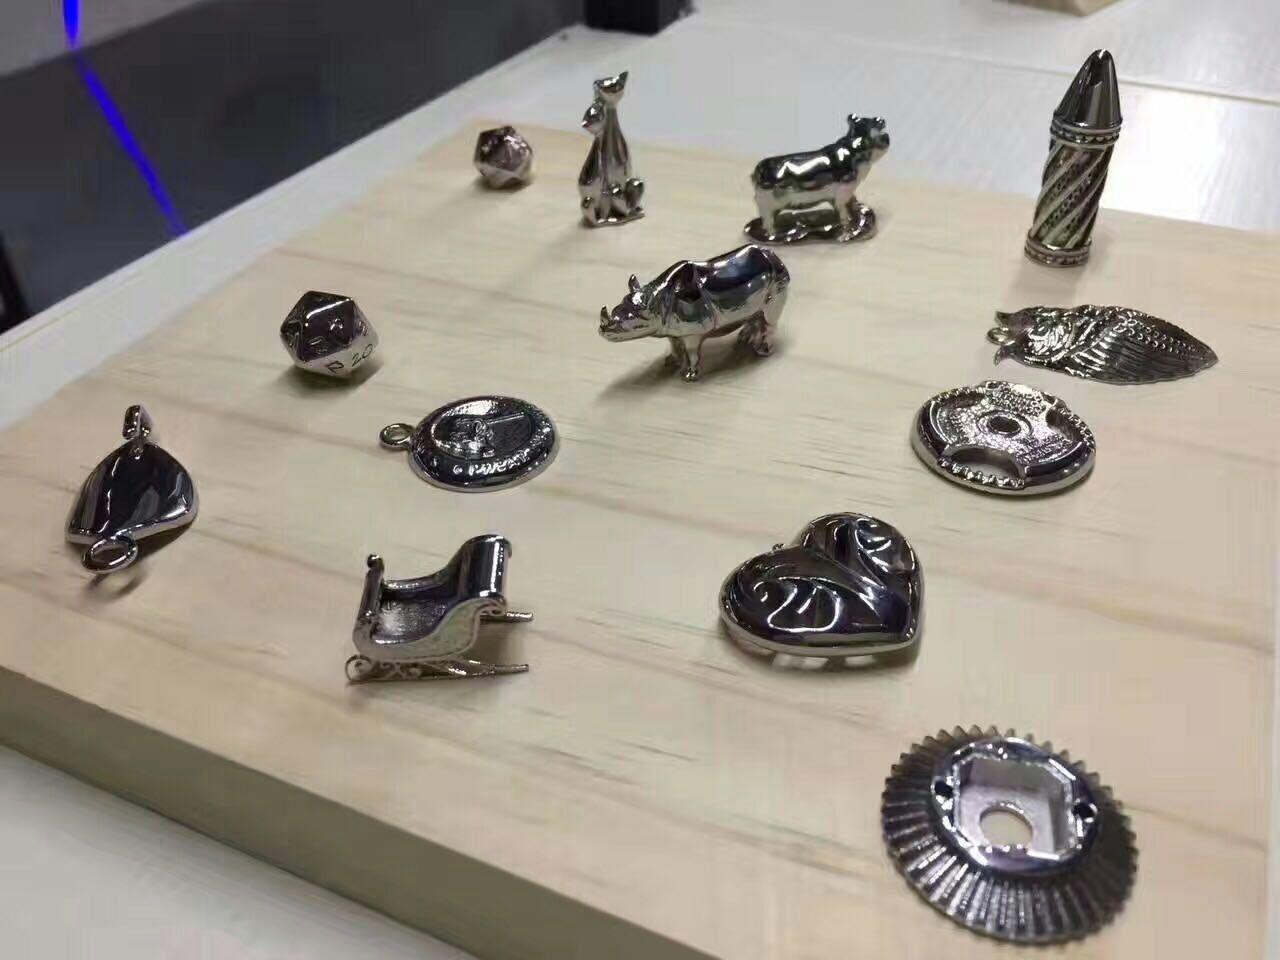 Metal 3D Printing various